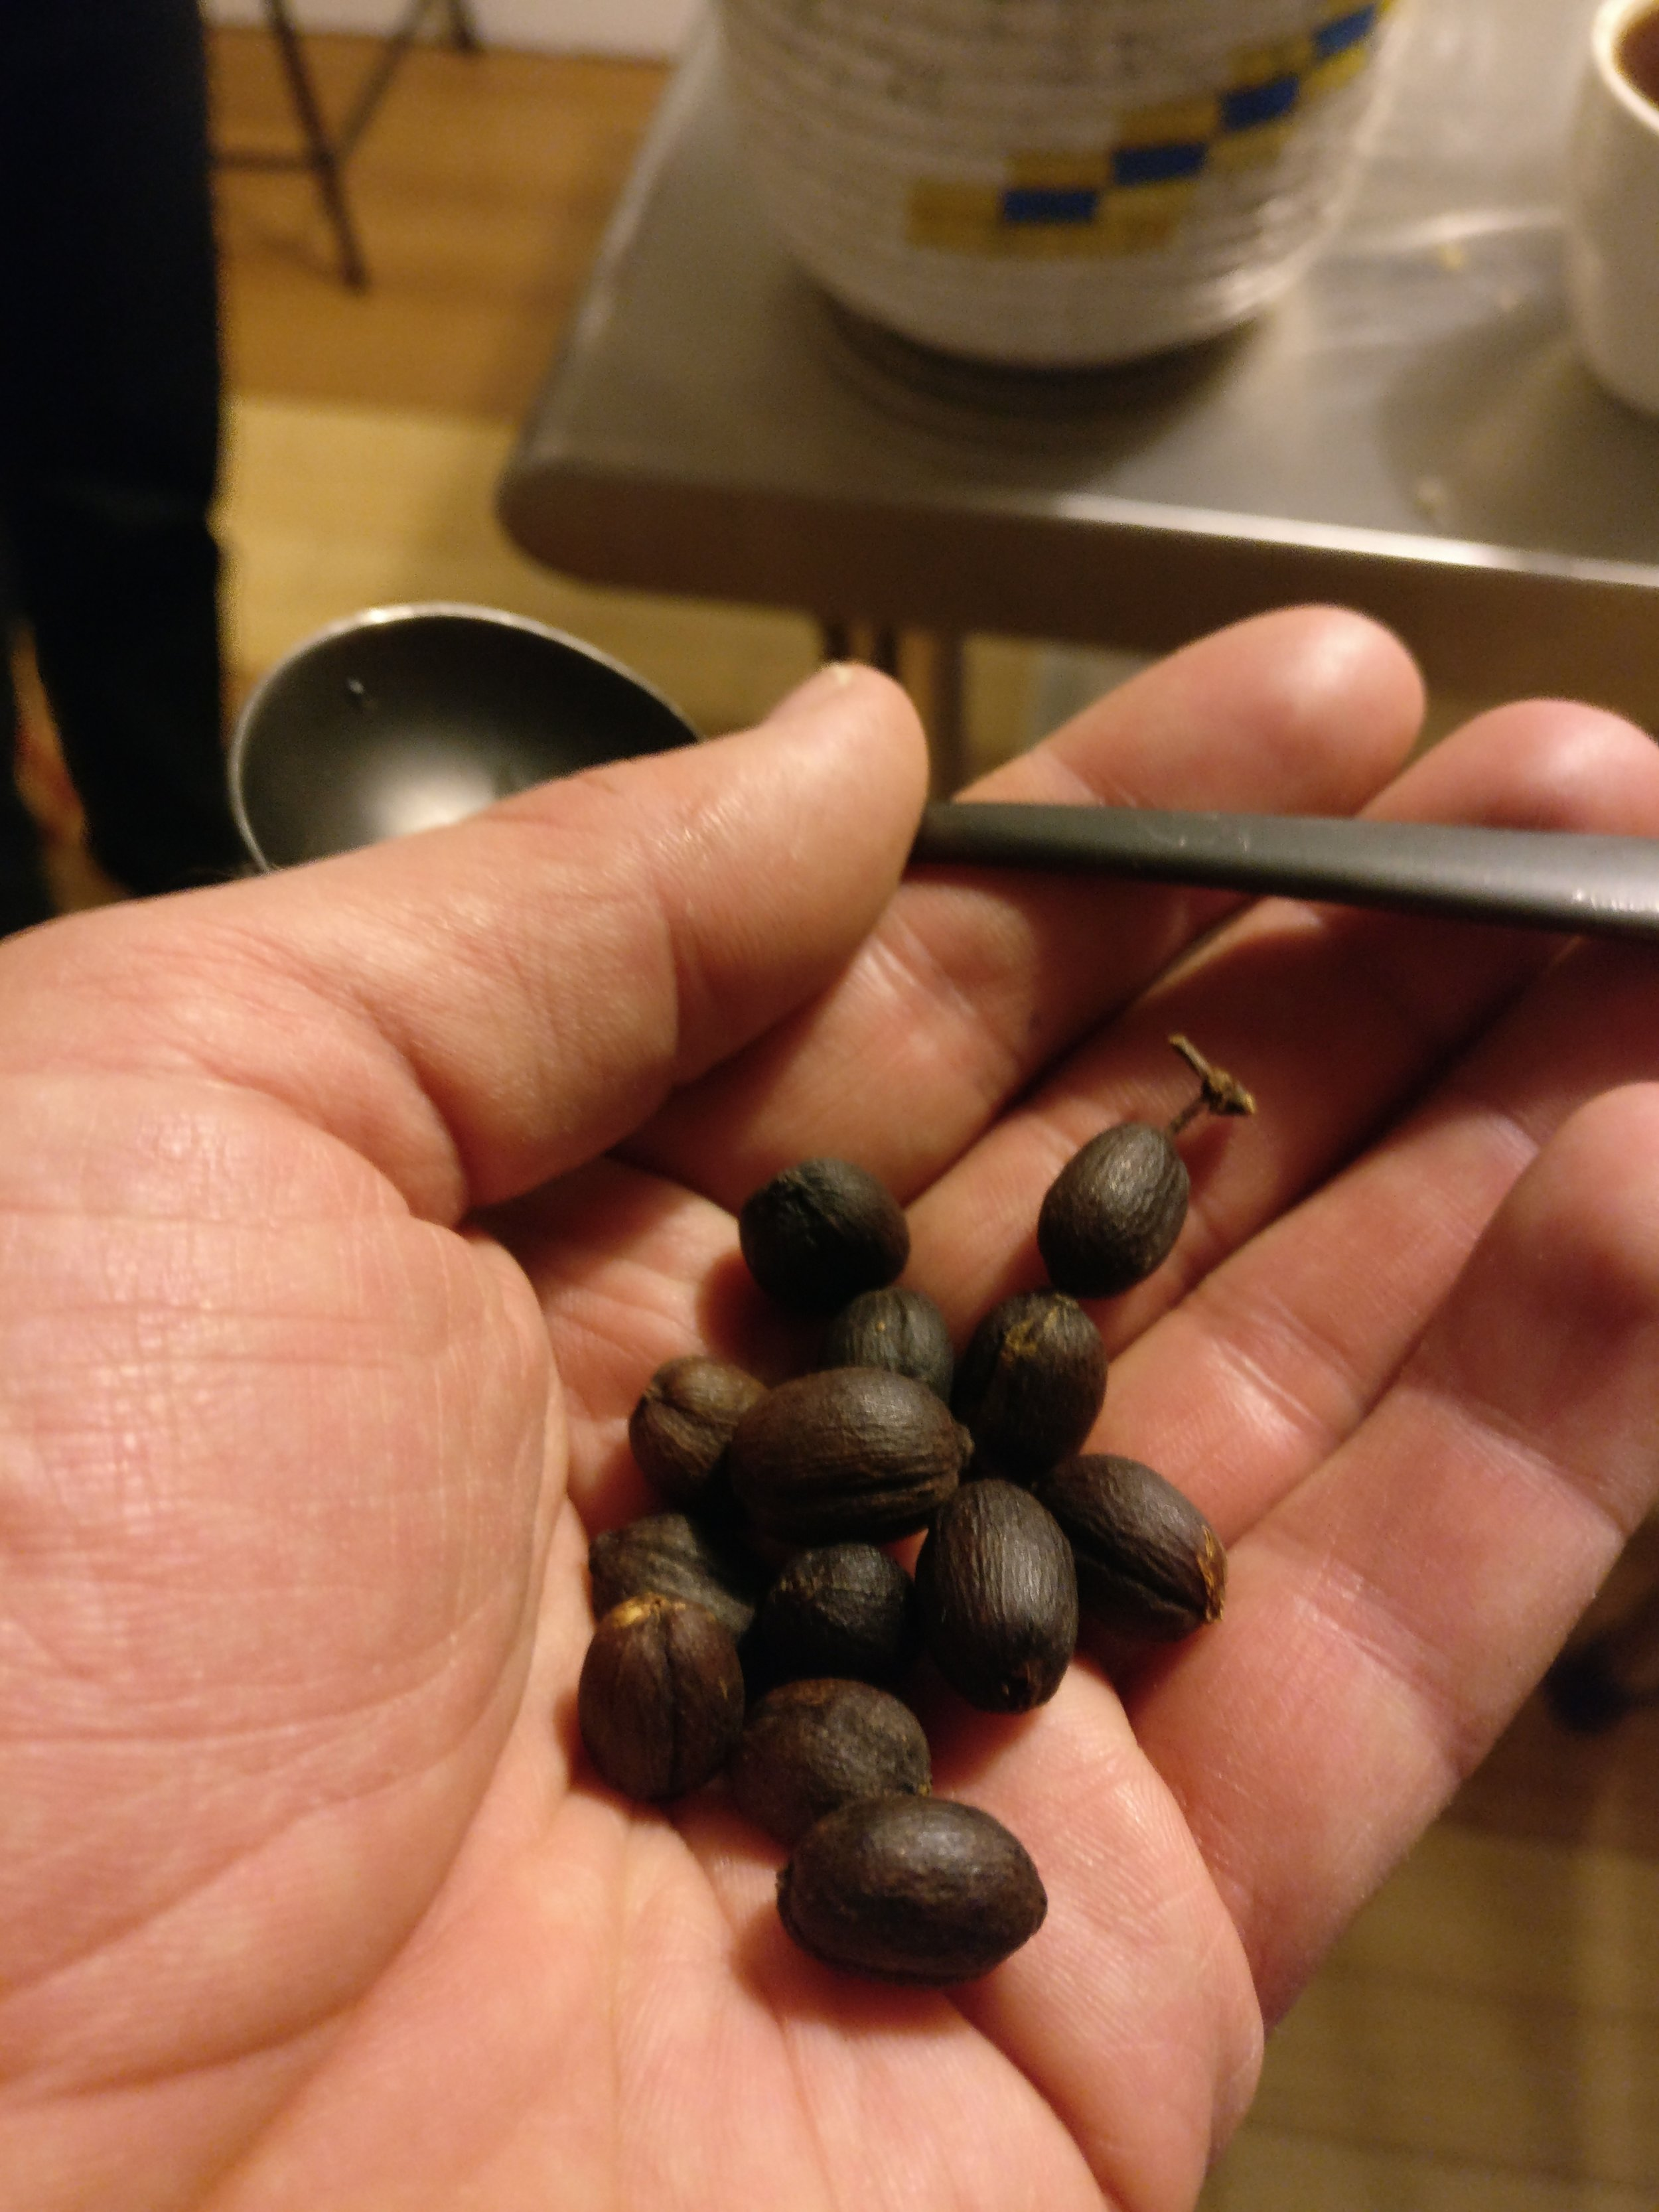 Freshly roasted bean